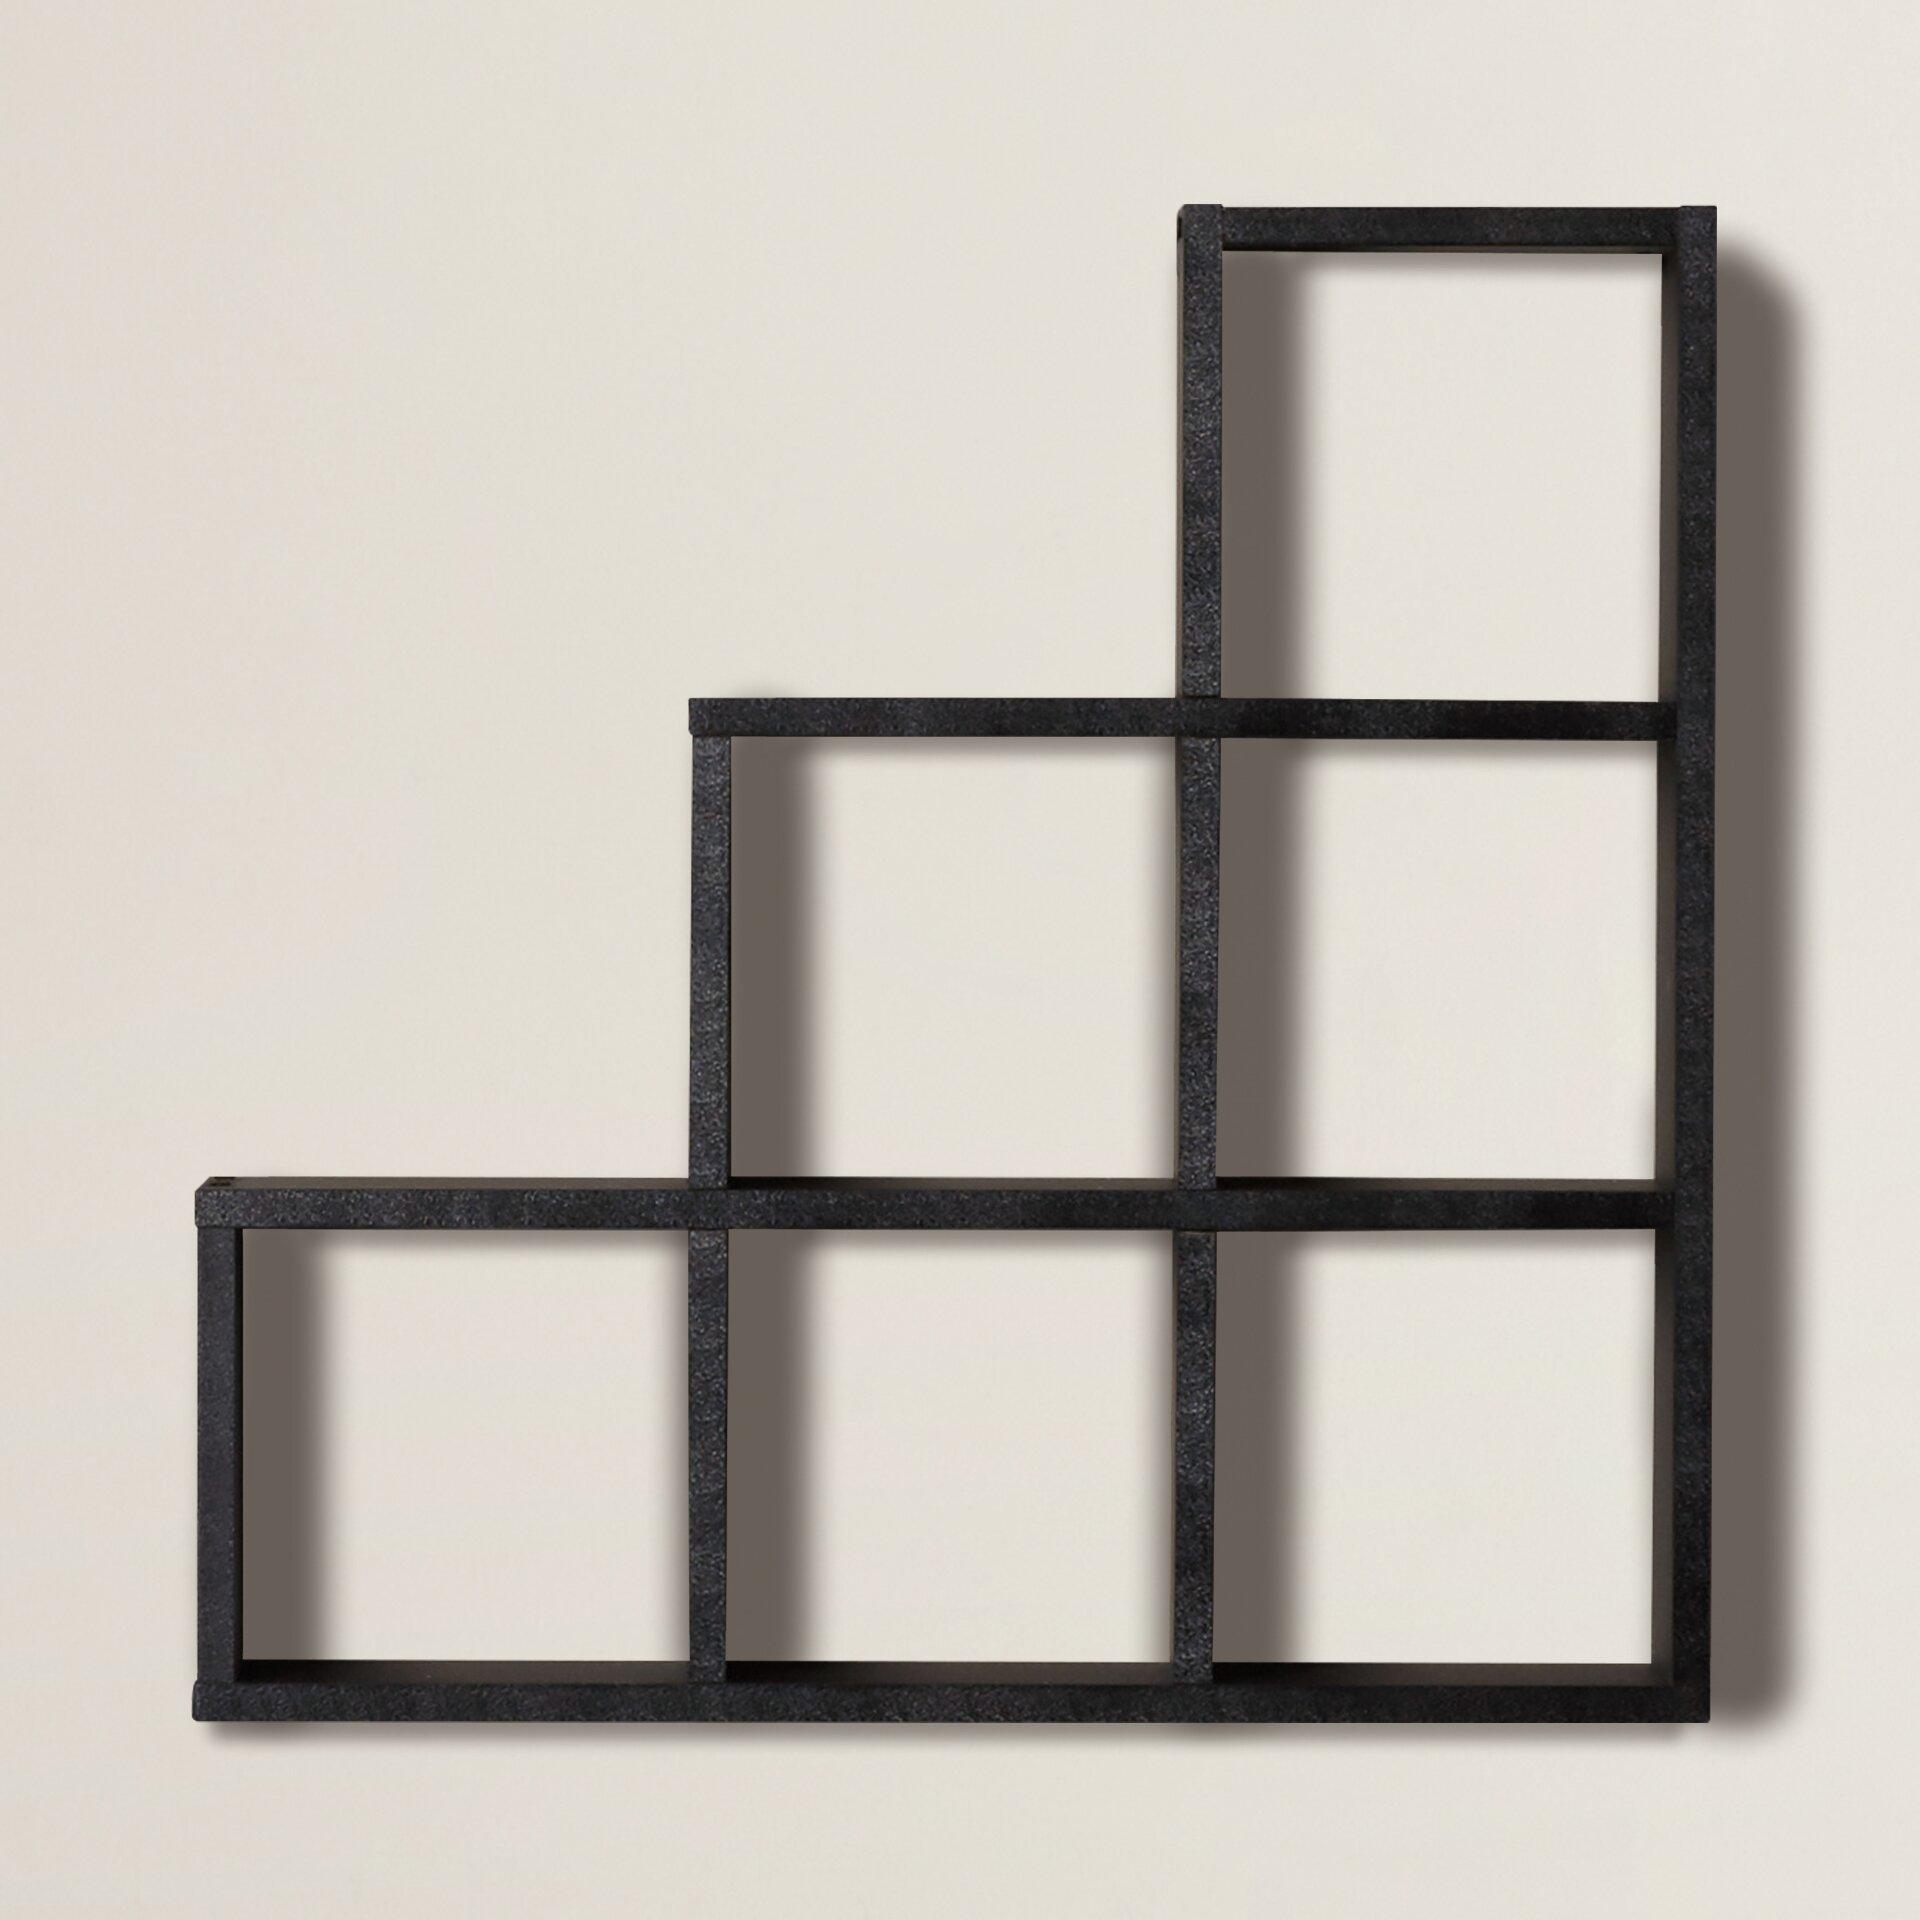 Brayden Studio Bermondsey Stepped 6 Cubby Decorative Wall